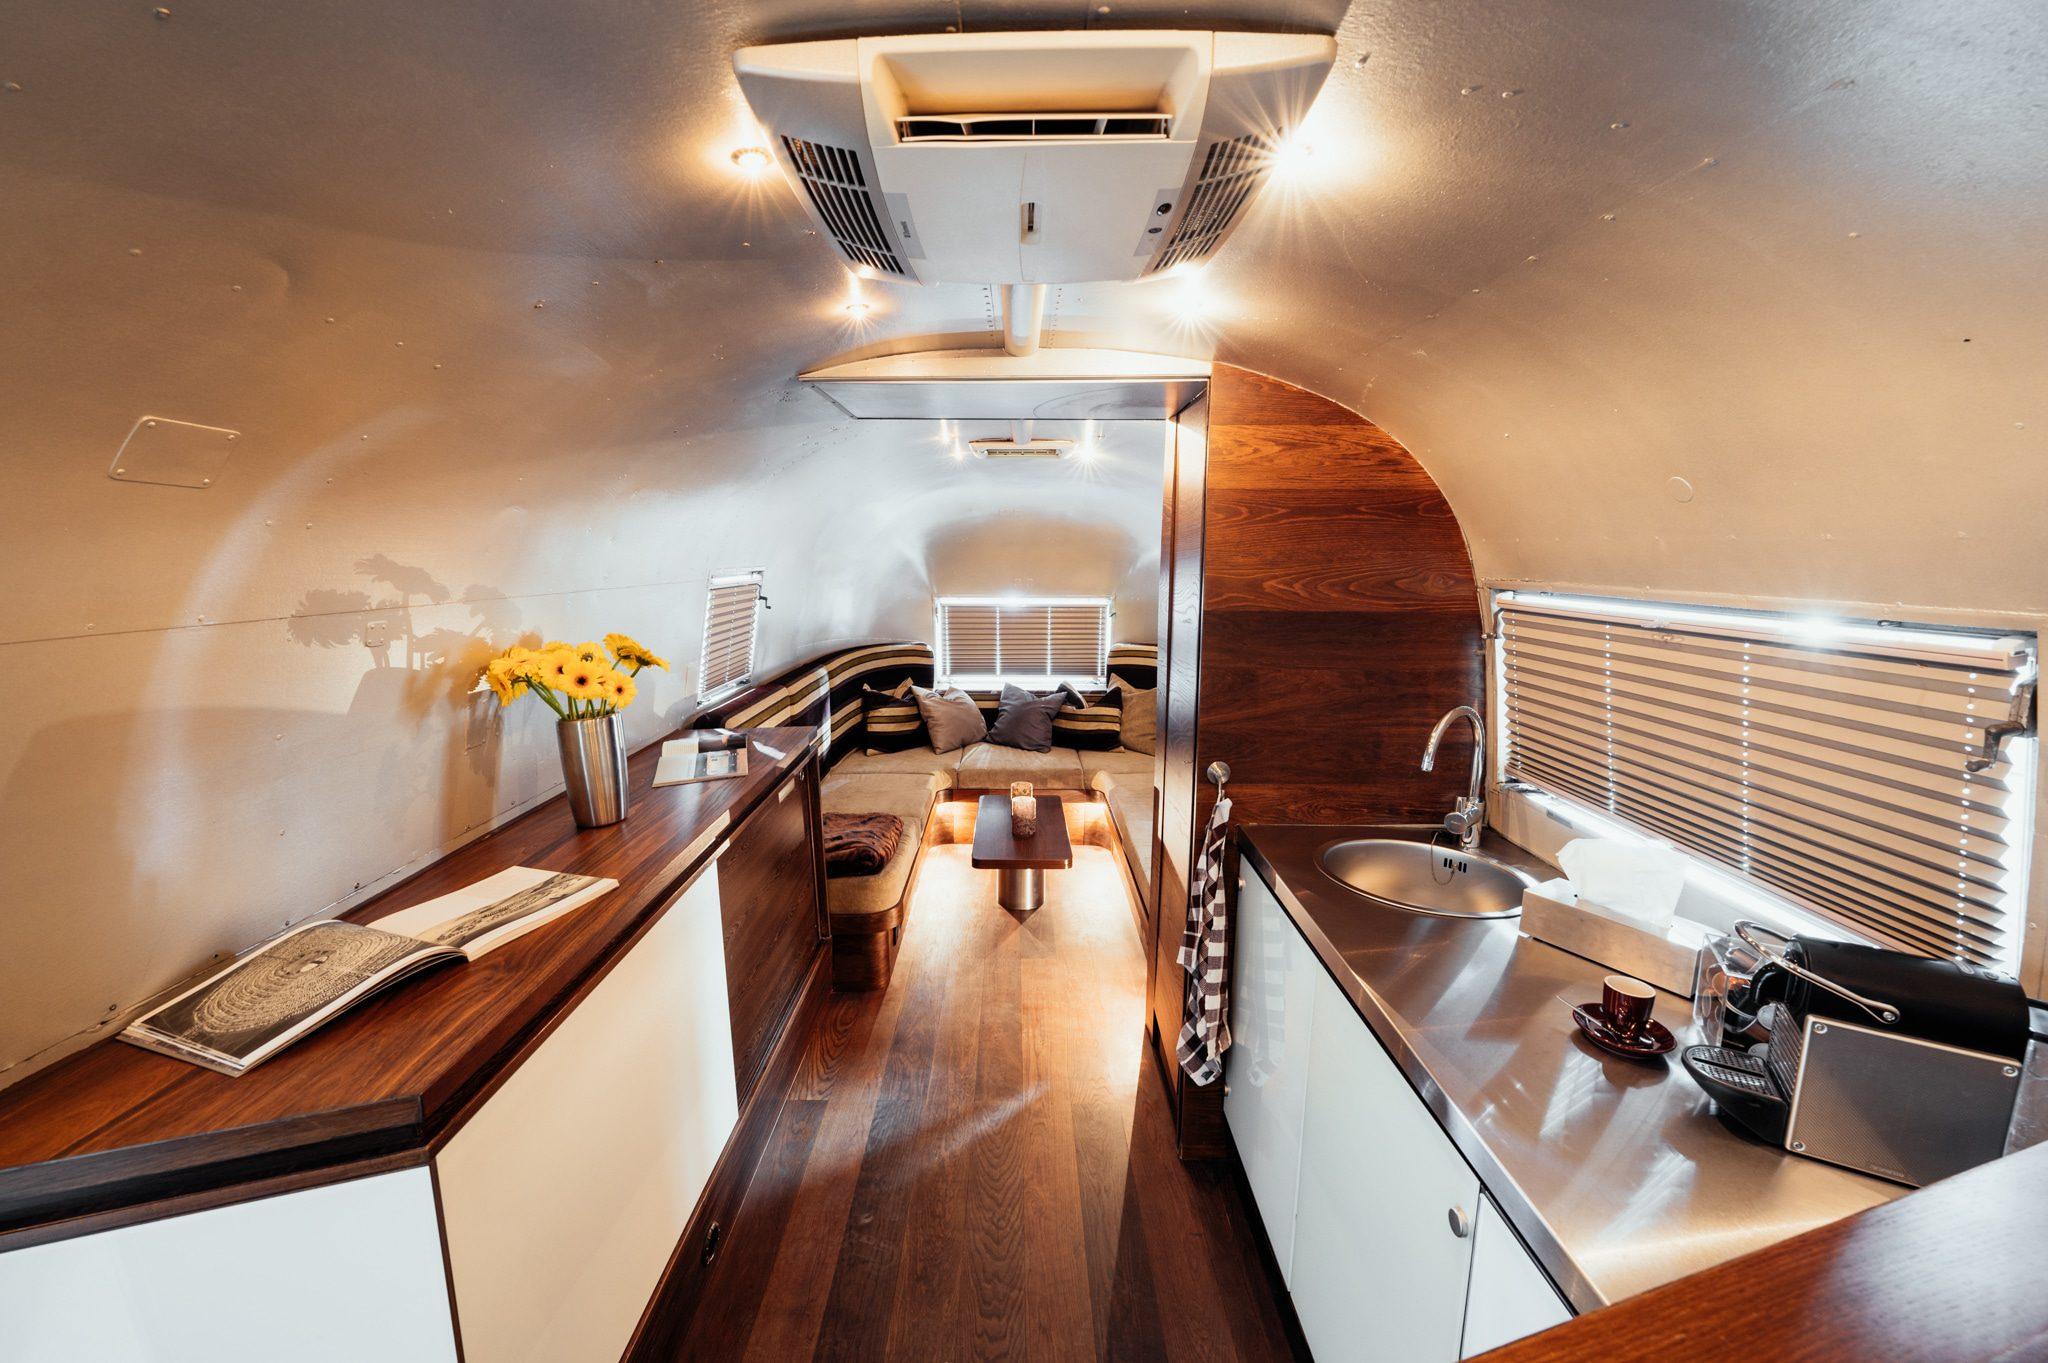 Airstream-I innen Kühe-Silverbase